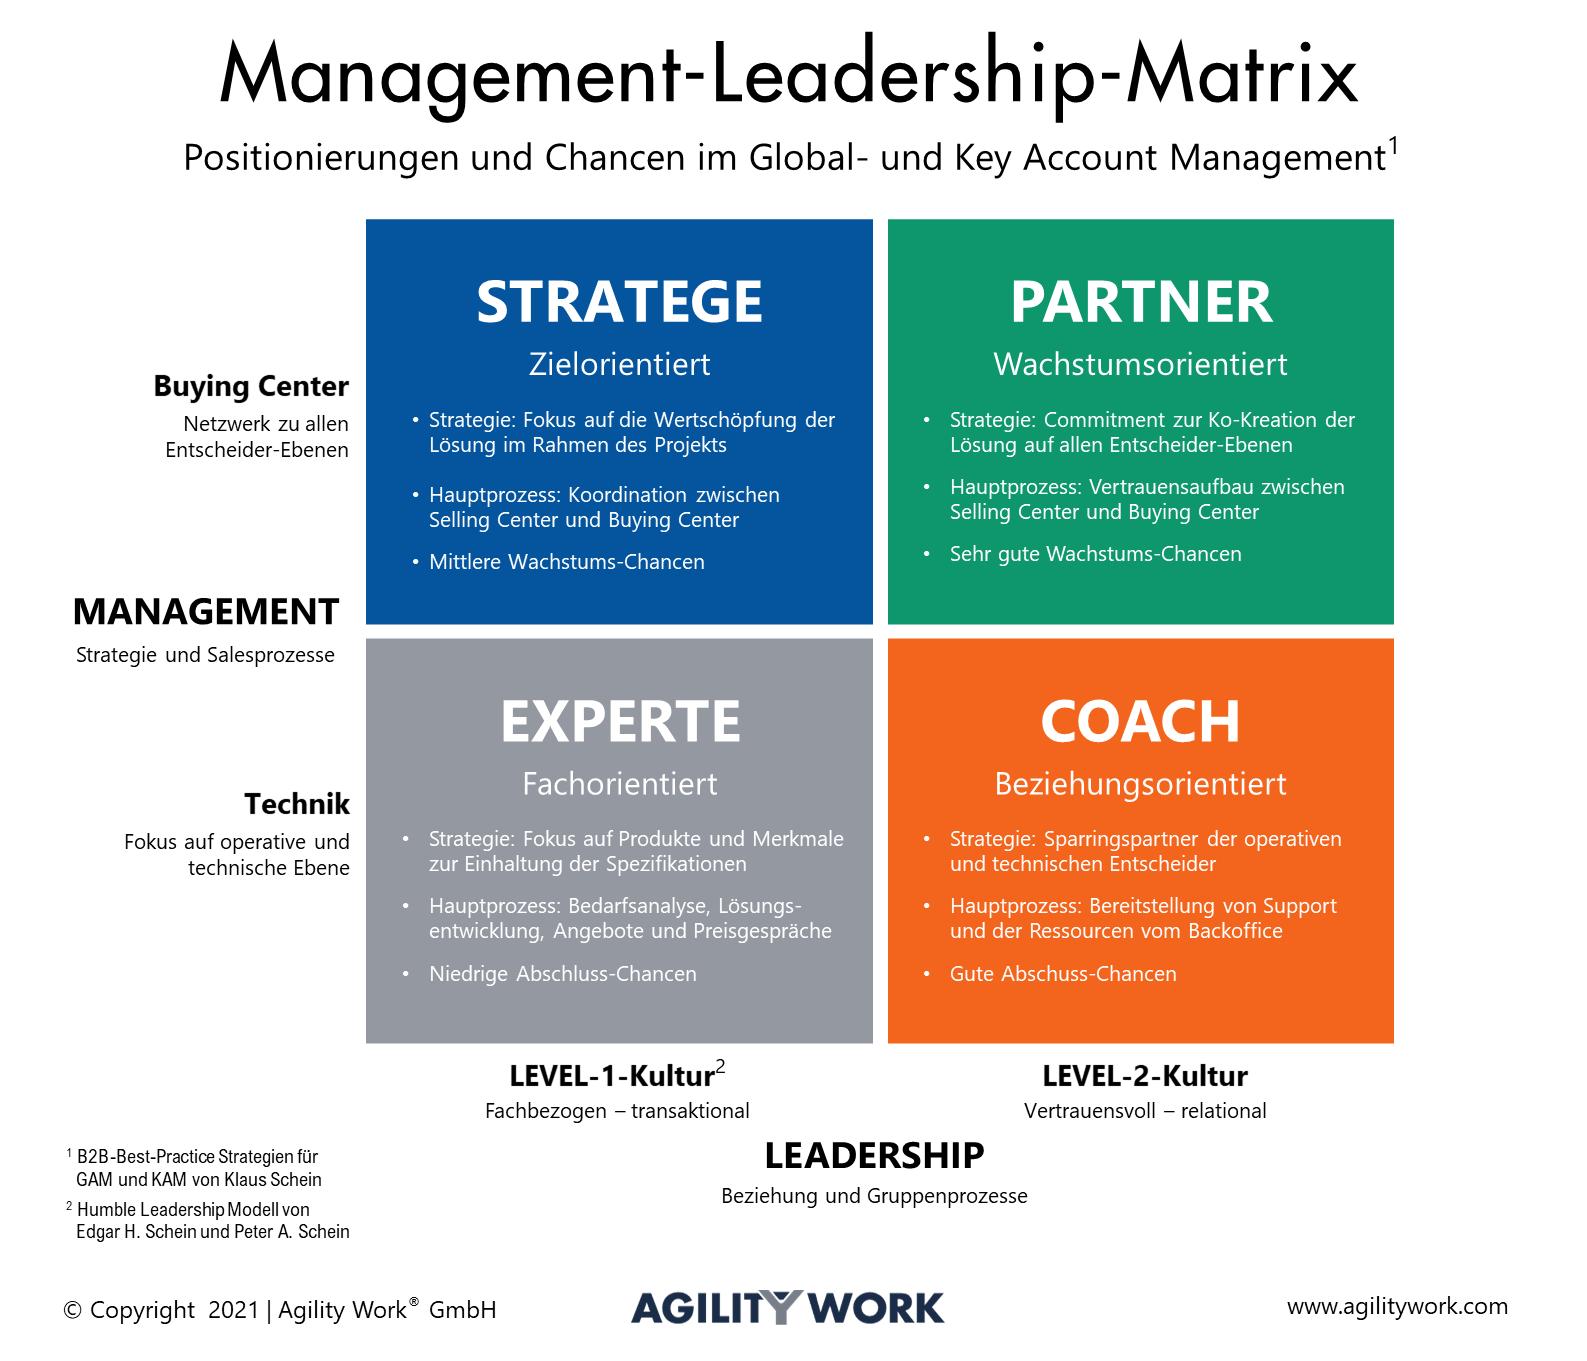 Management-Leadership-Matrix